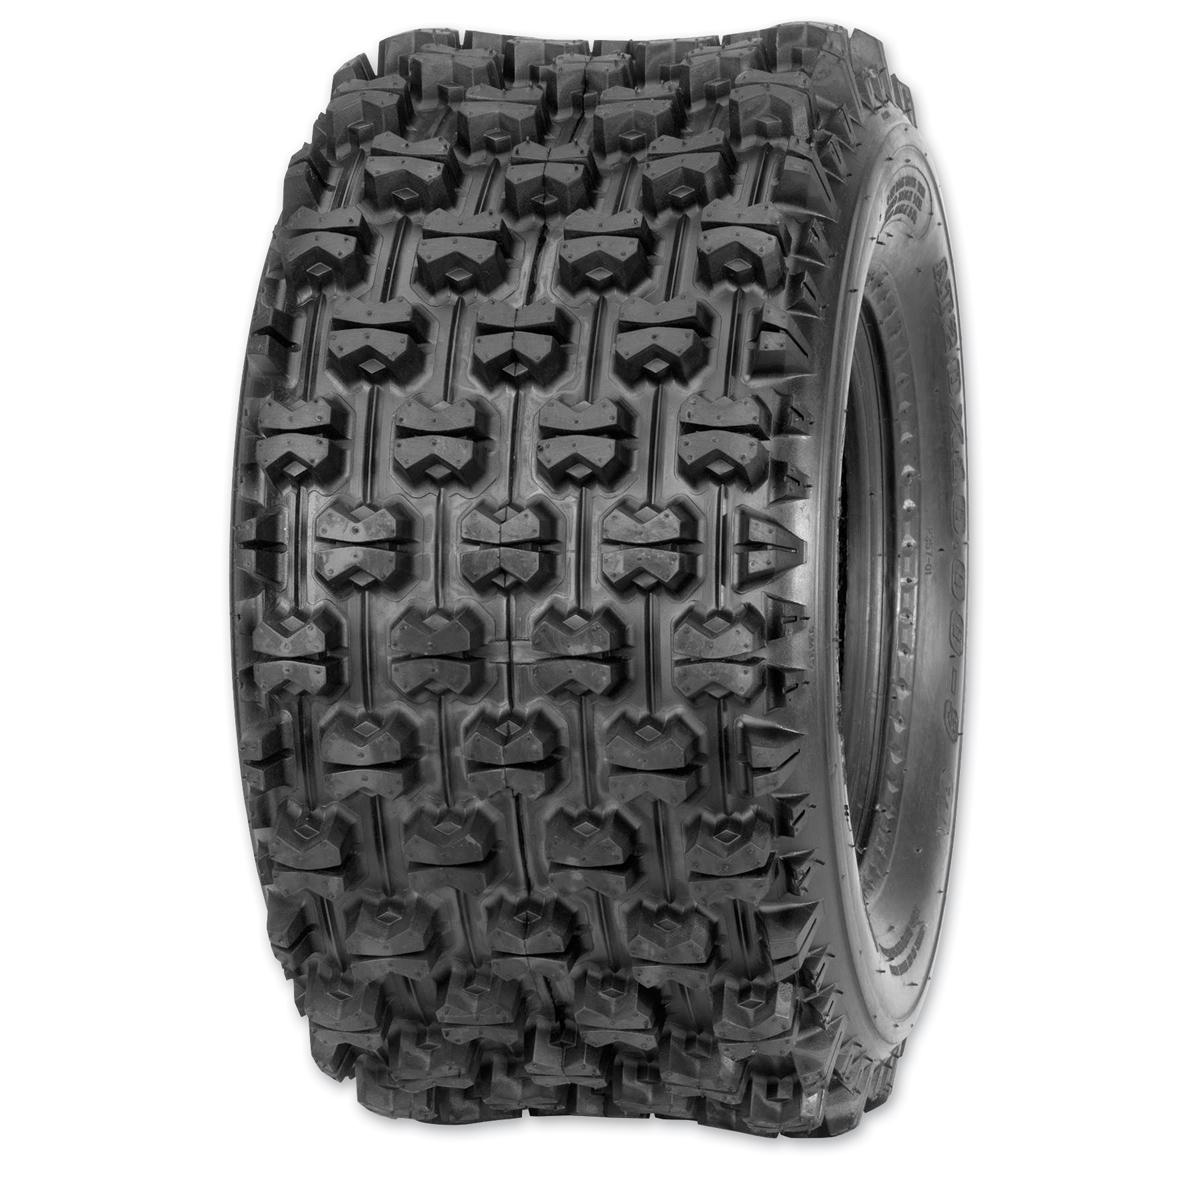 Quadboss QBT739 20X10-9 4-Ply Rear Tire